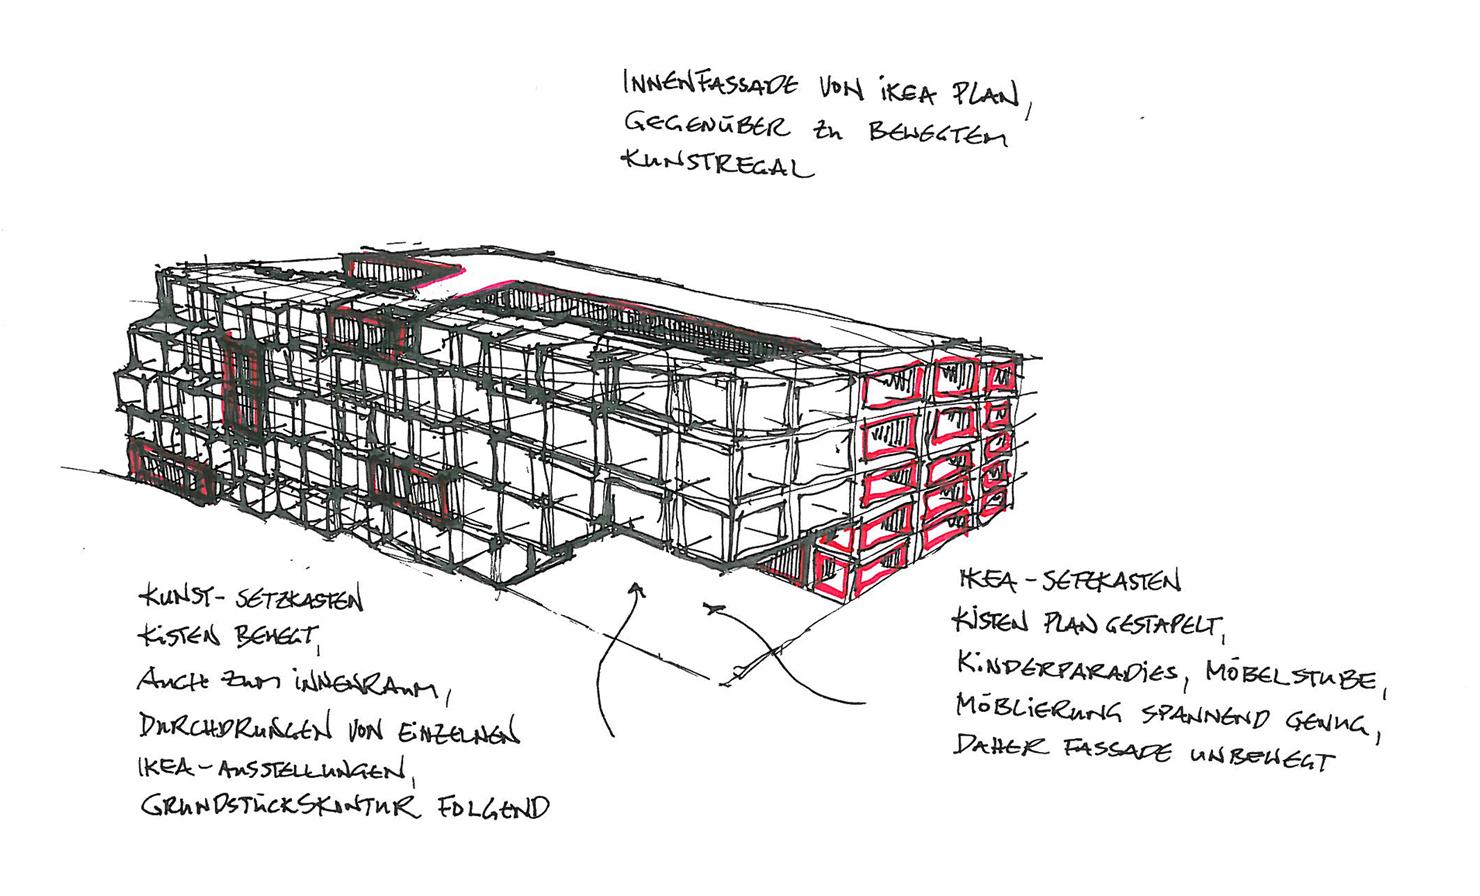 Ikea altona hamburg schaltraum architekten hamburg for Architekten hamburg altona